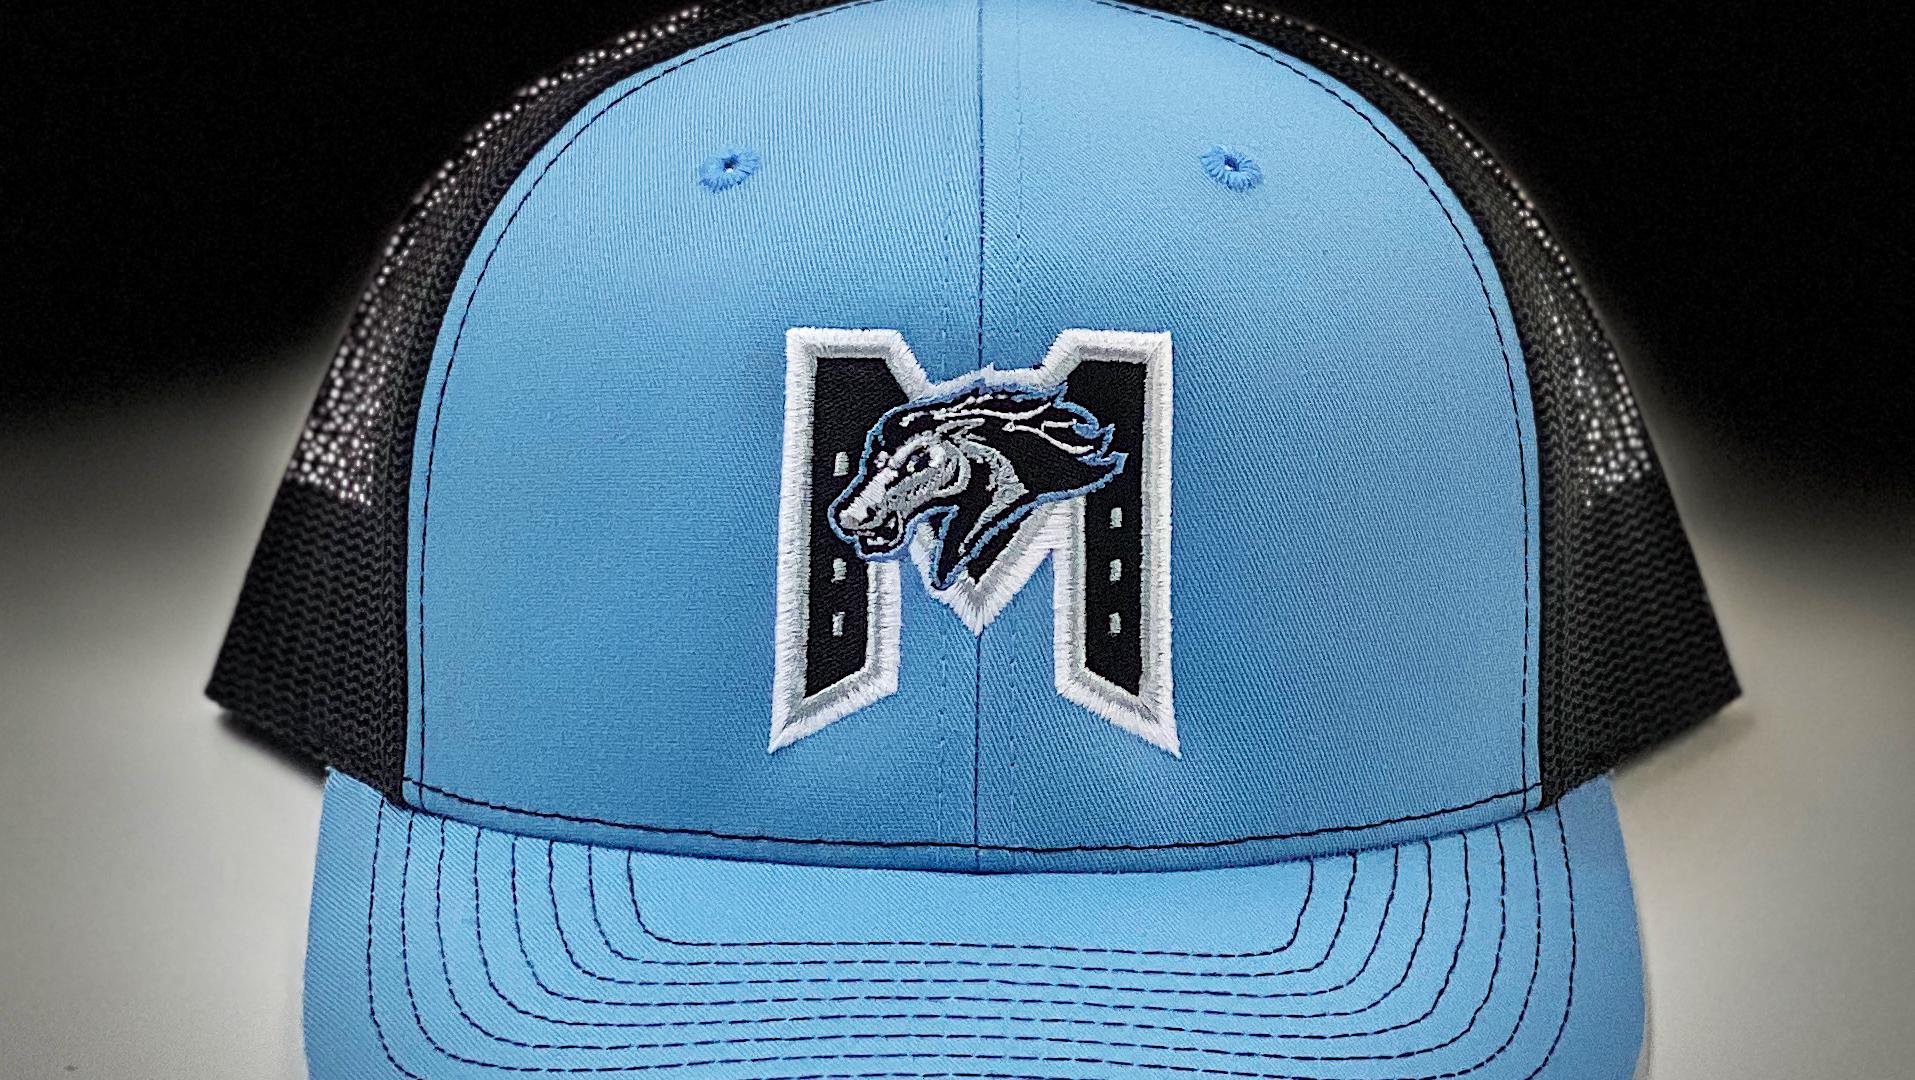 Mavericks Flat Stitch